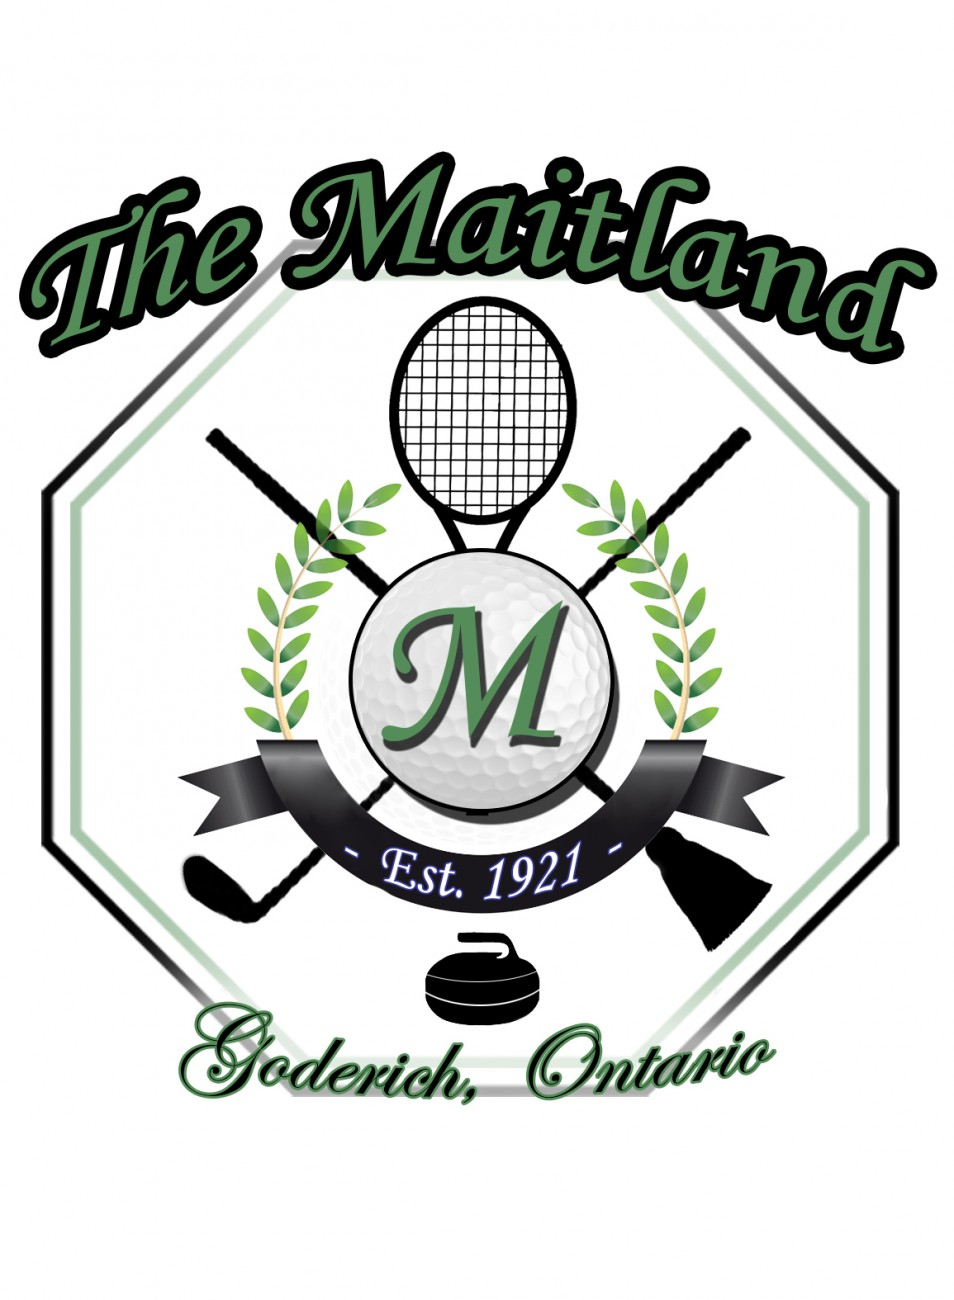 The Maitland